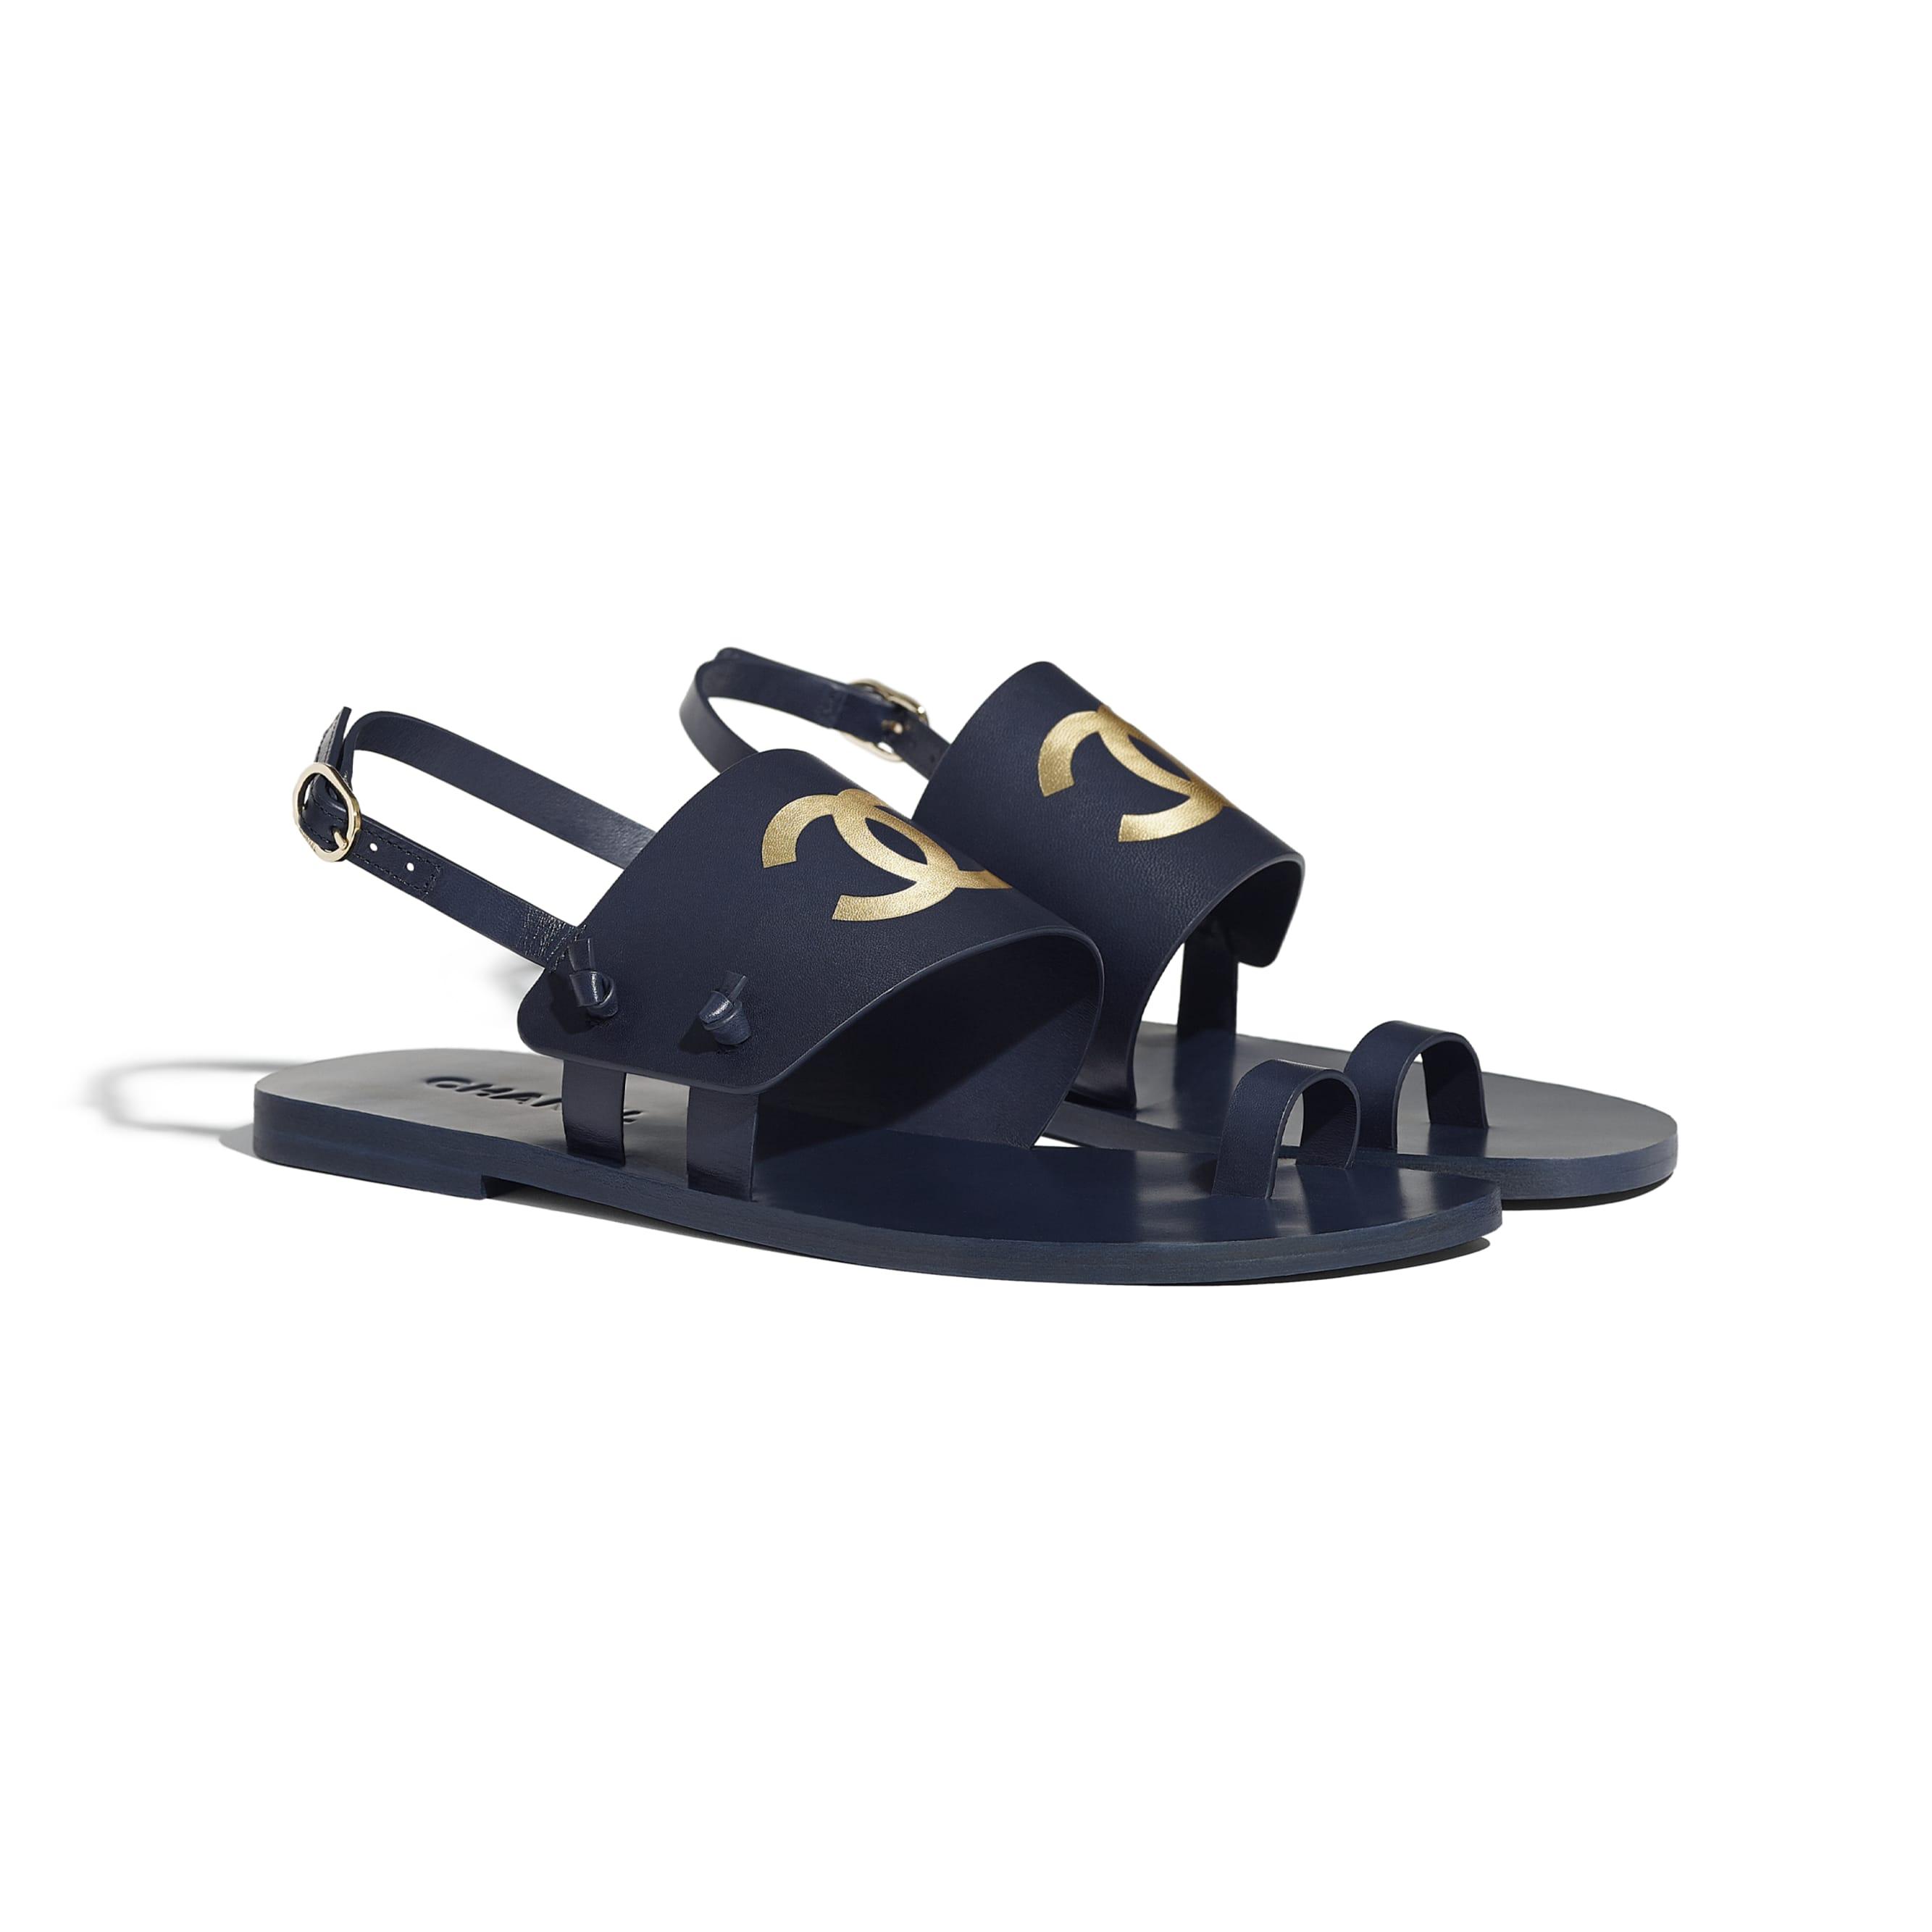 Sandals - Navy Blue - Goatskin - CHANEL - Alternative view - see standard sized version